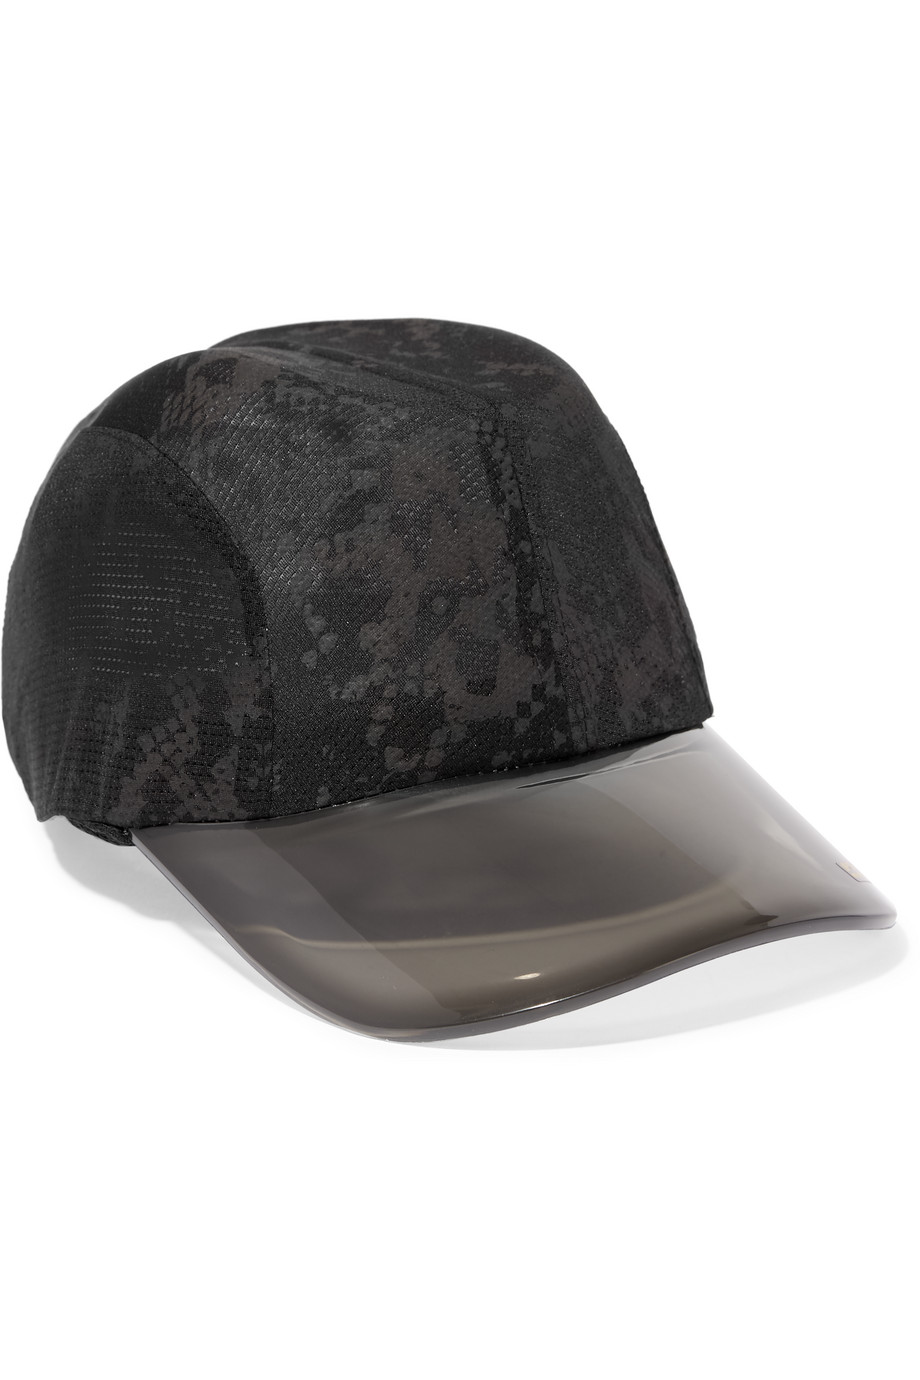 Printed Stretch-Mesh Cap, Adidas by Stella Mccartney, Black, Women's, Size: One size